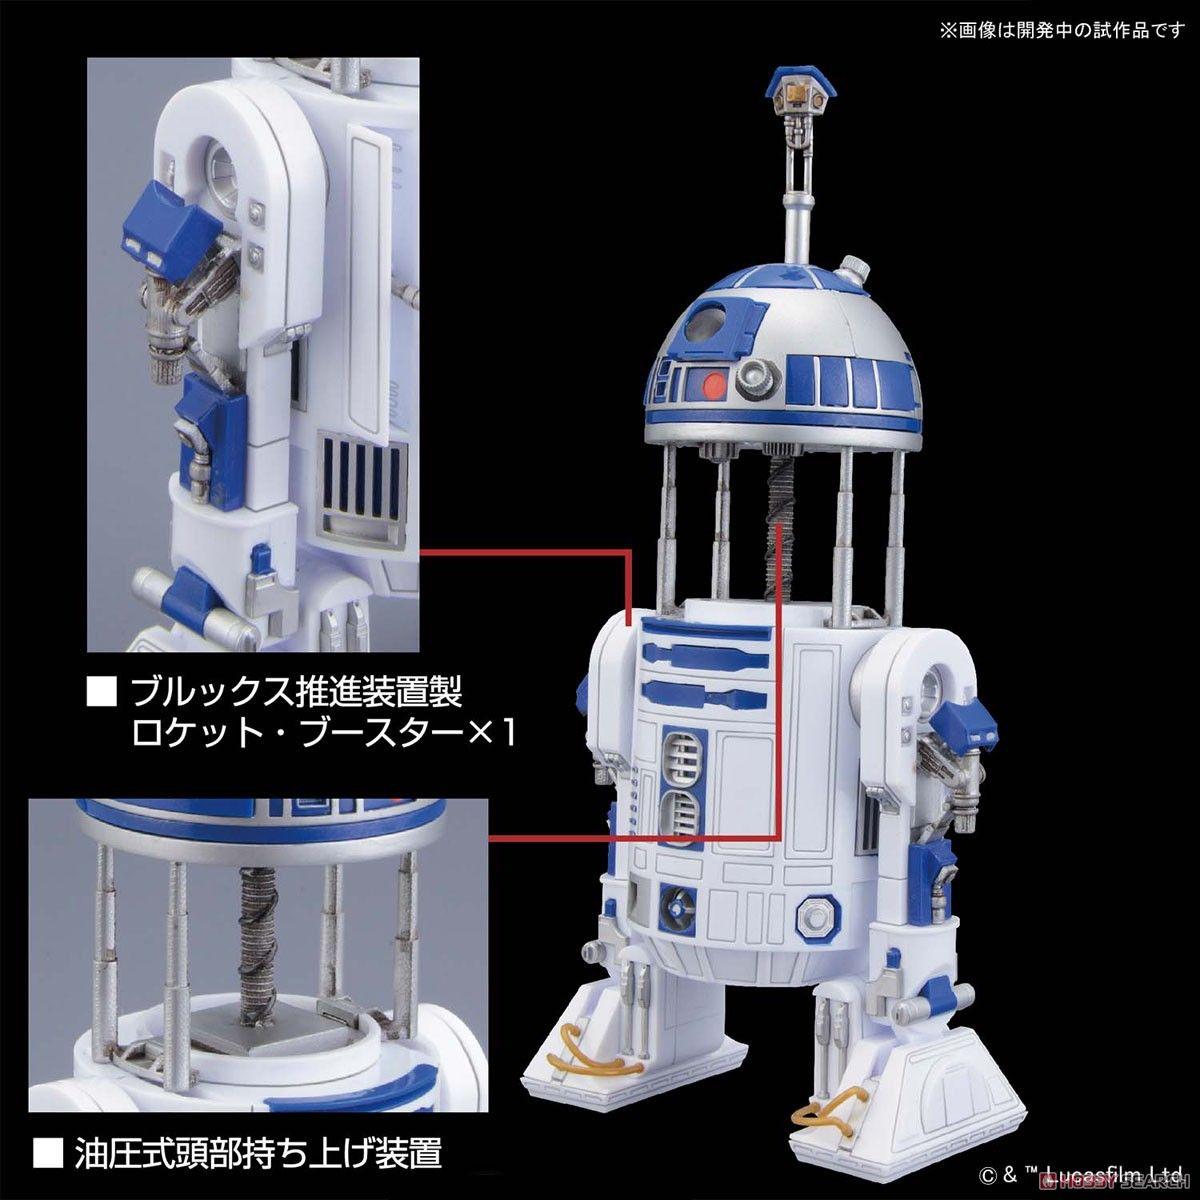 Bandai 553393 R2-D2 Rocket Booster ver.